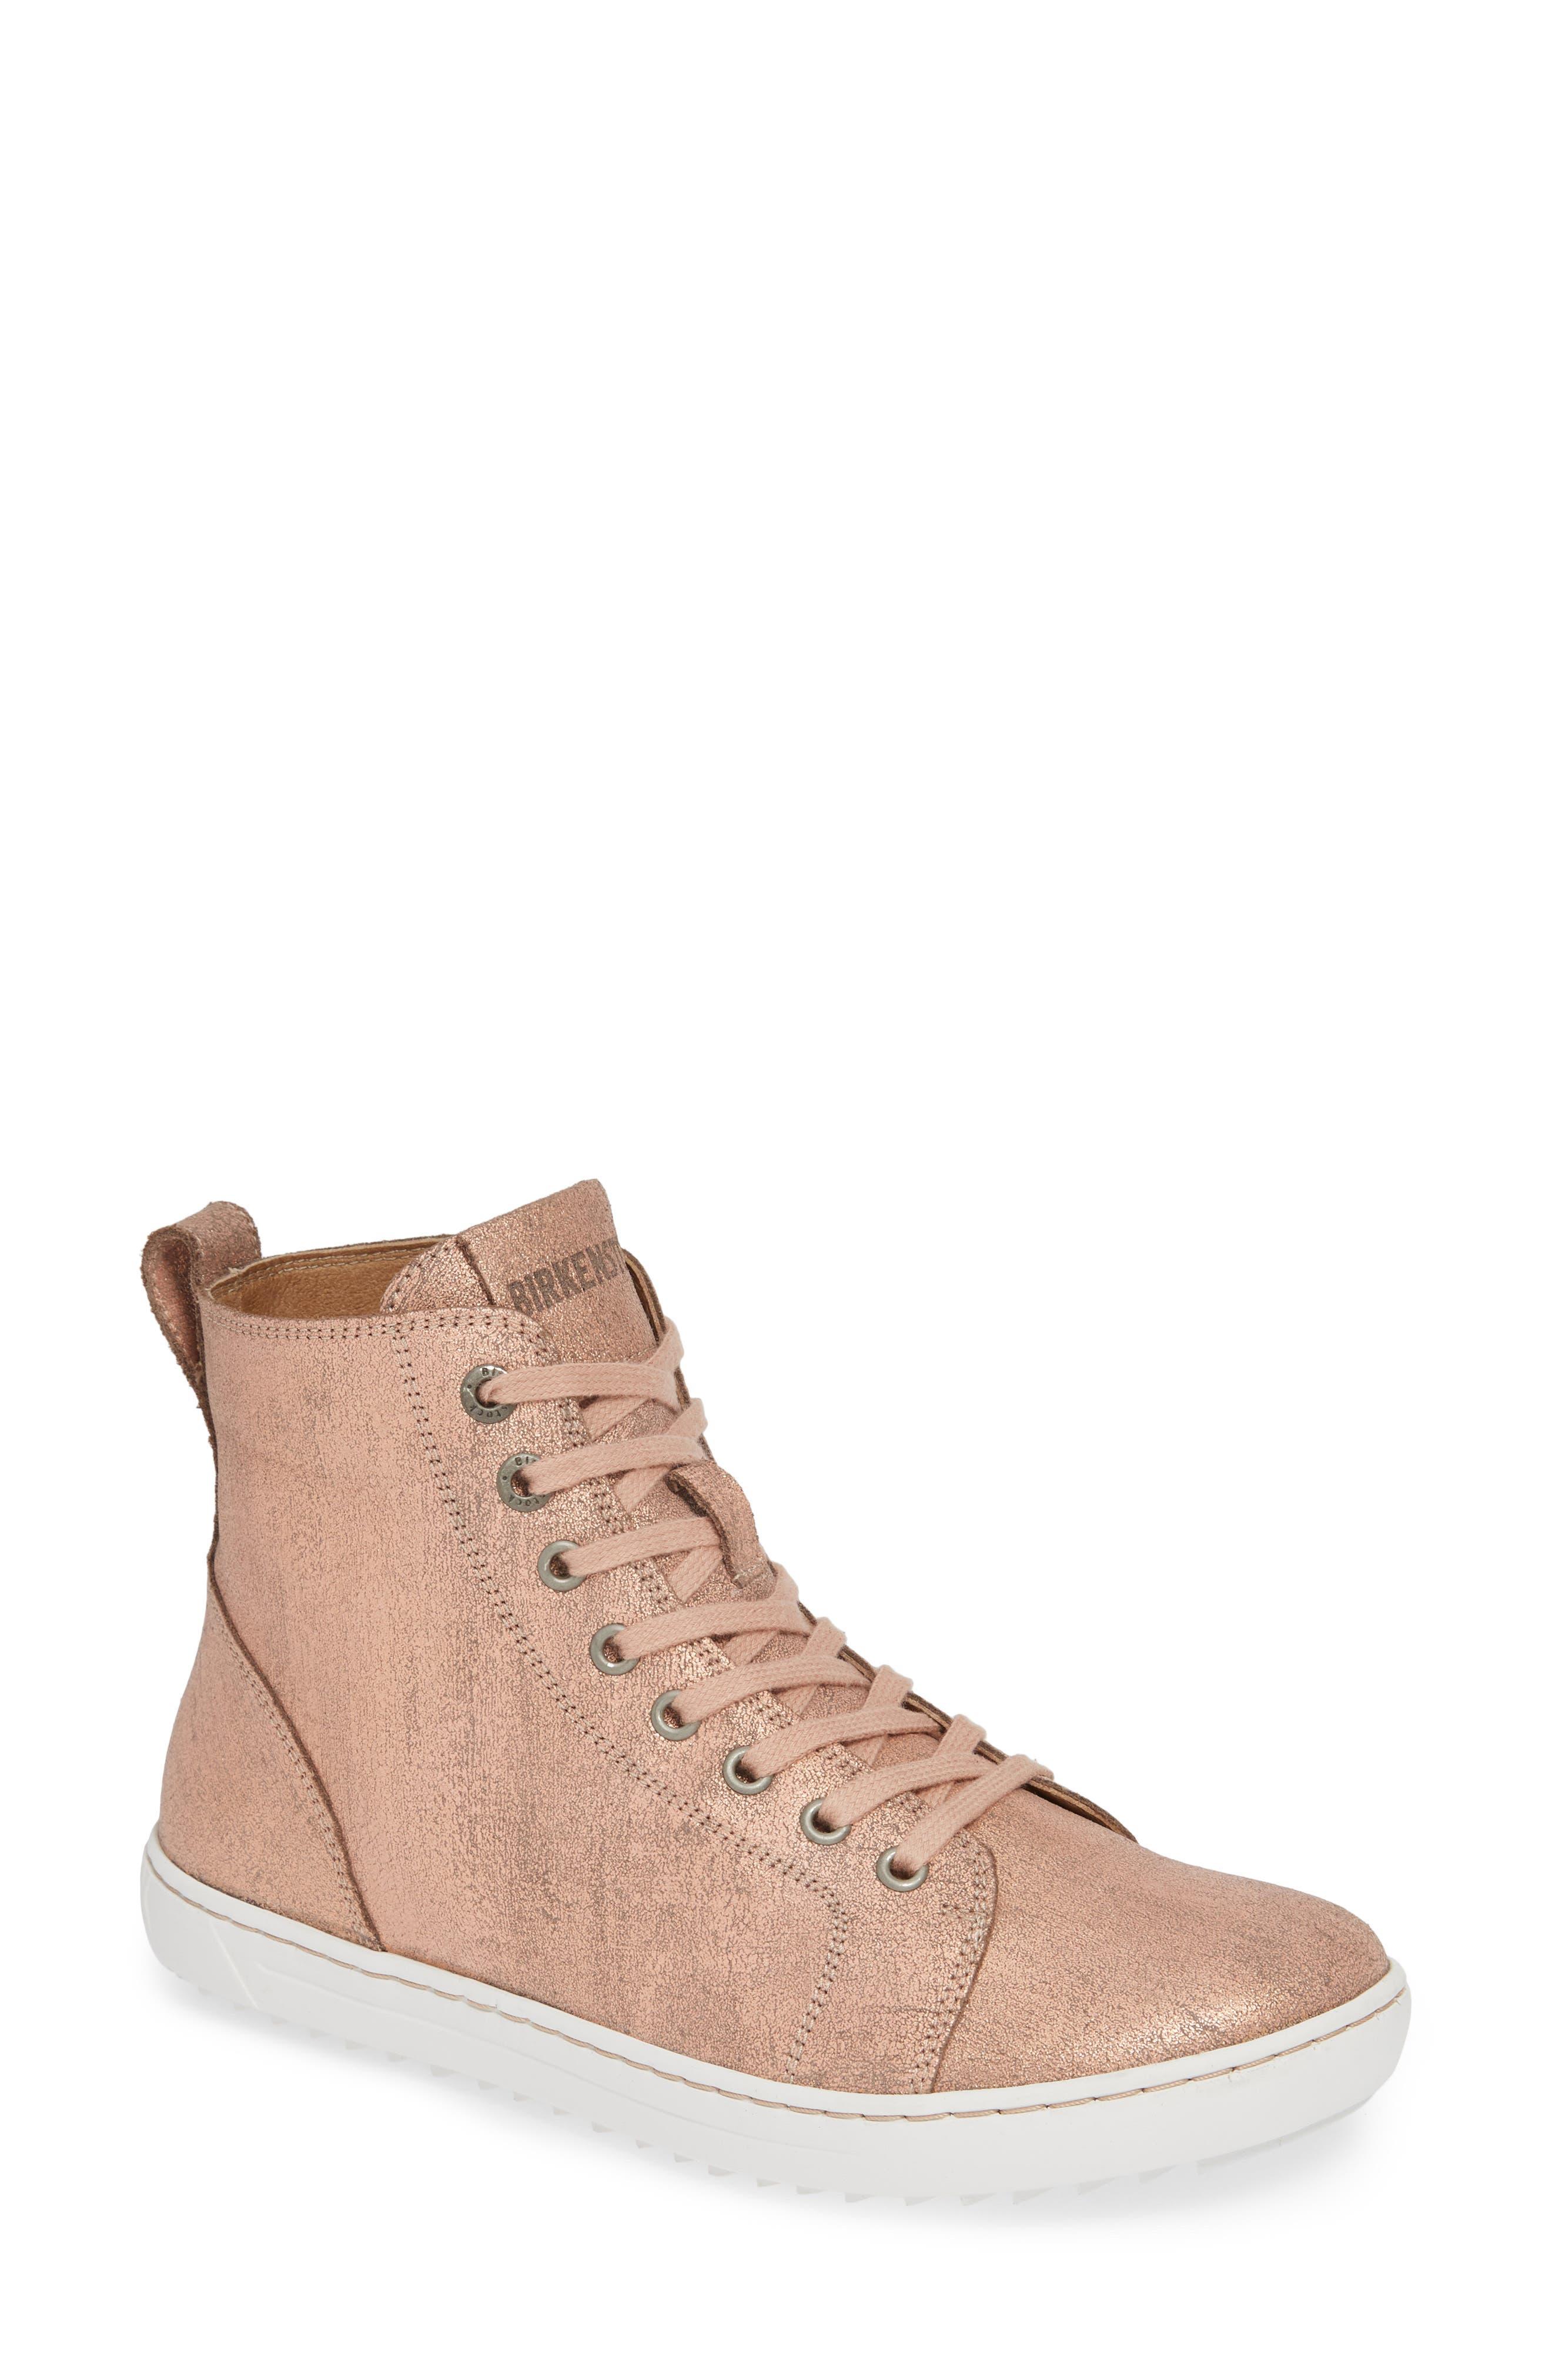 Bartlett High Top Sneaker,                         Main,                         color, METALLIC ROSE LEATHER